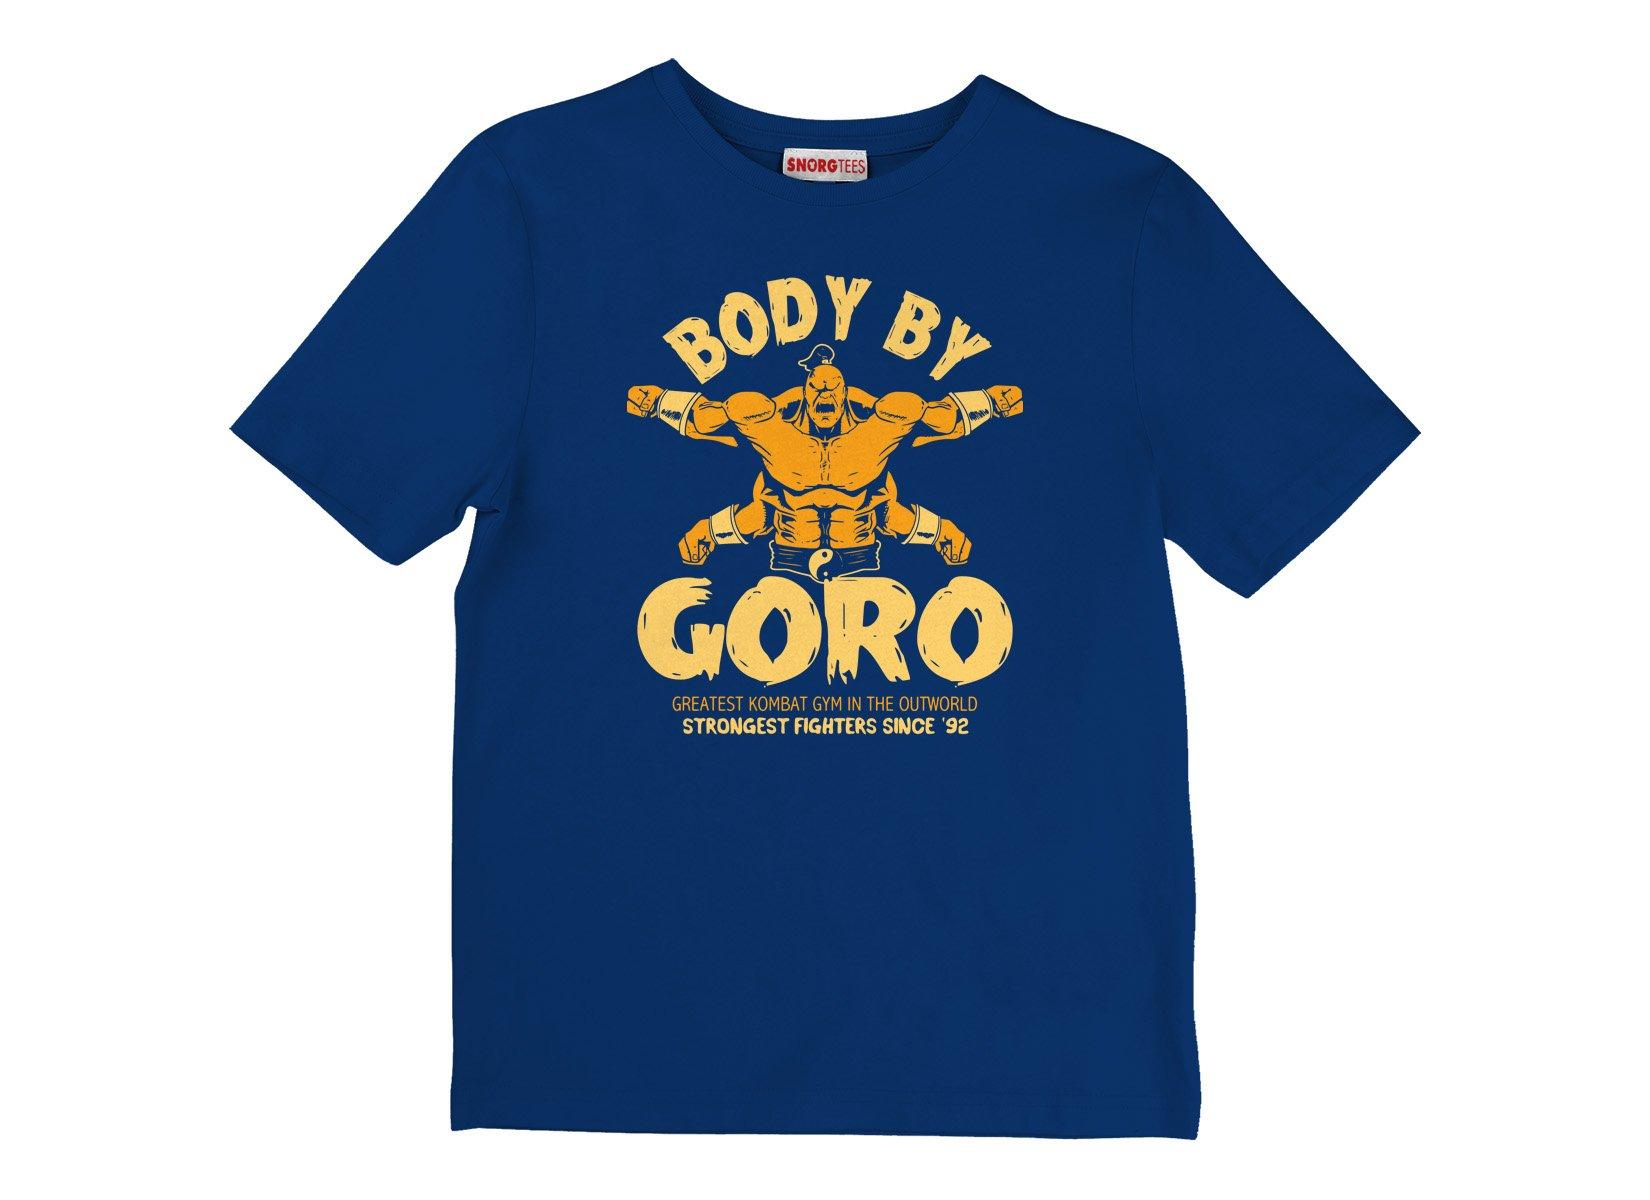 Body By Goro on Kids T-Shirt